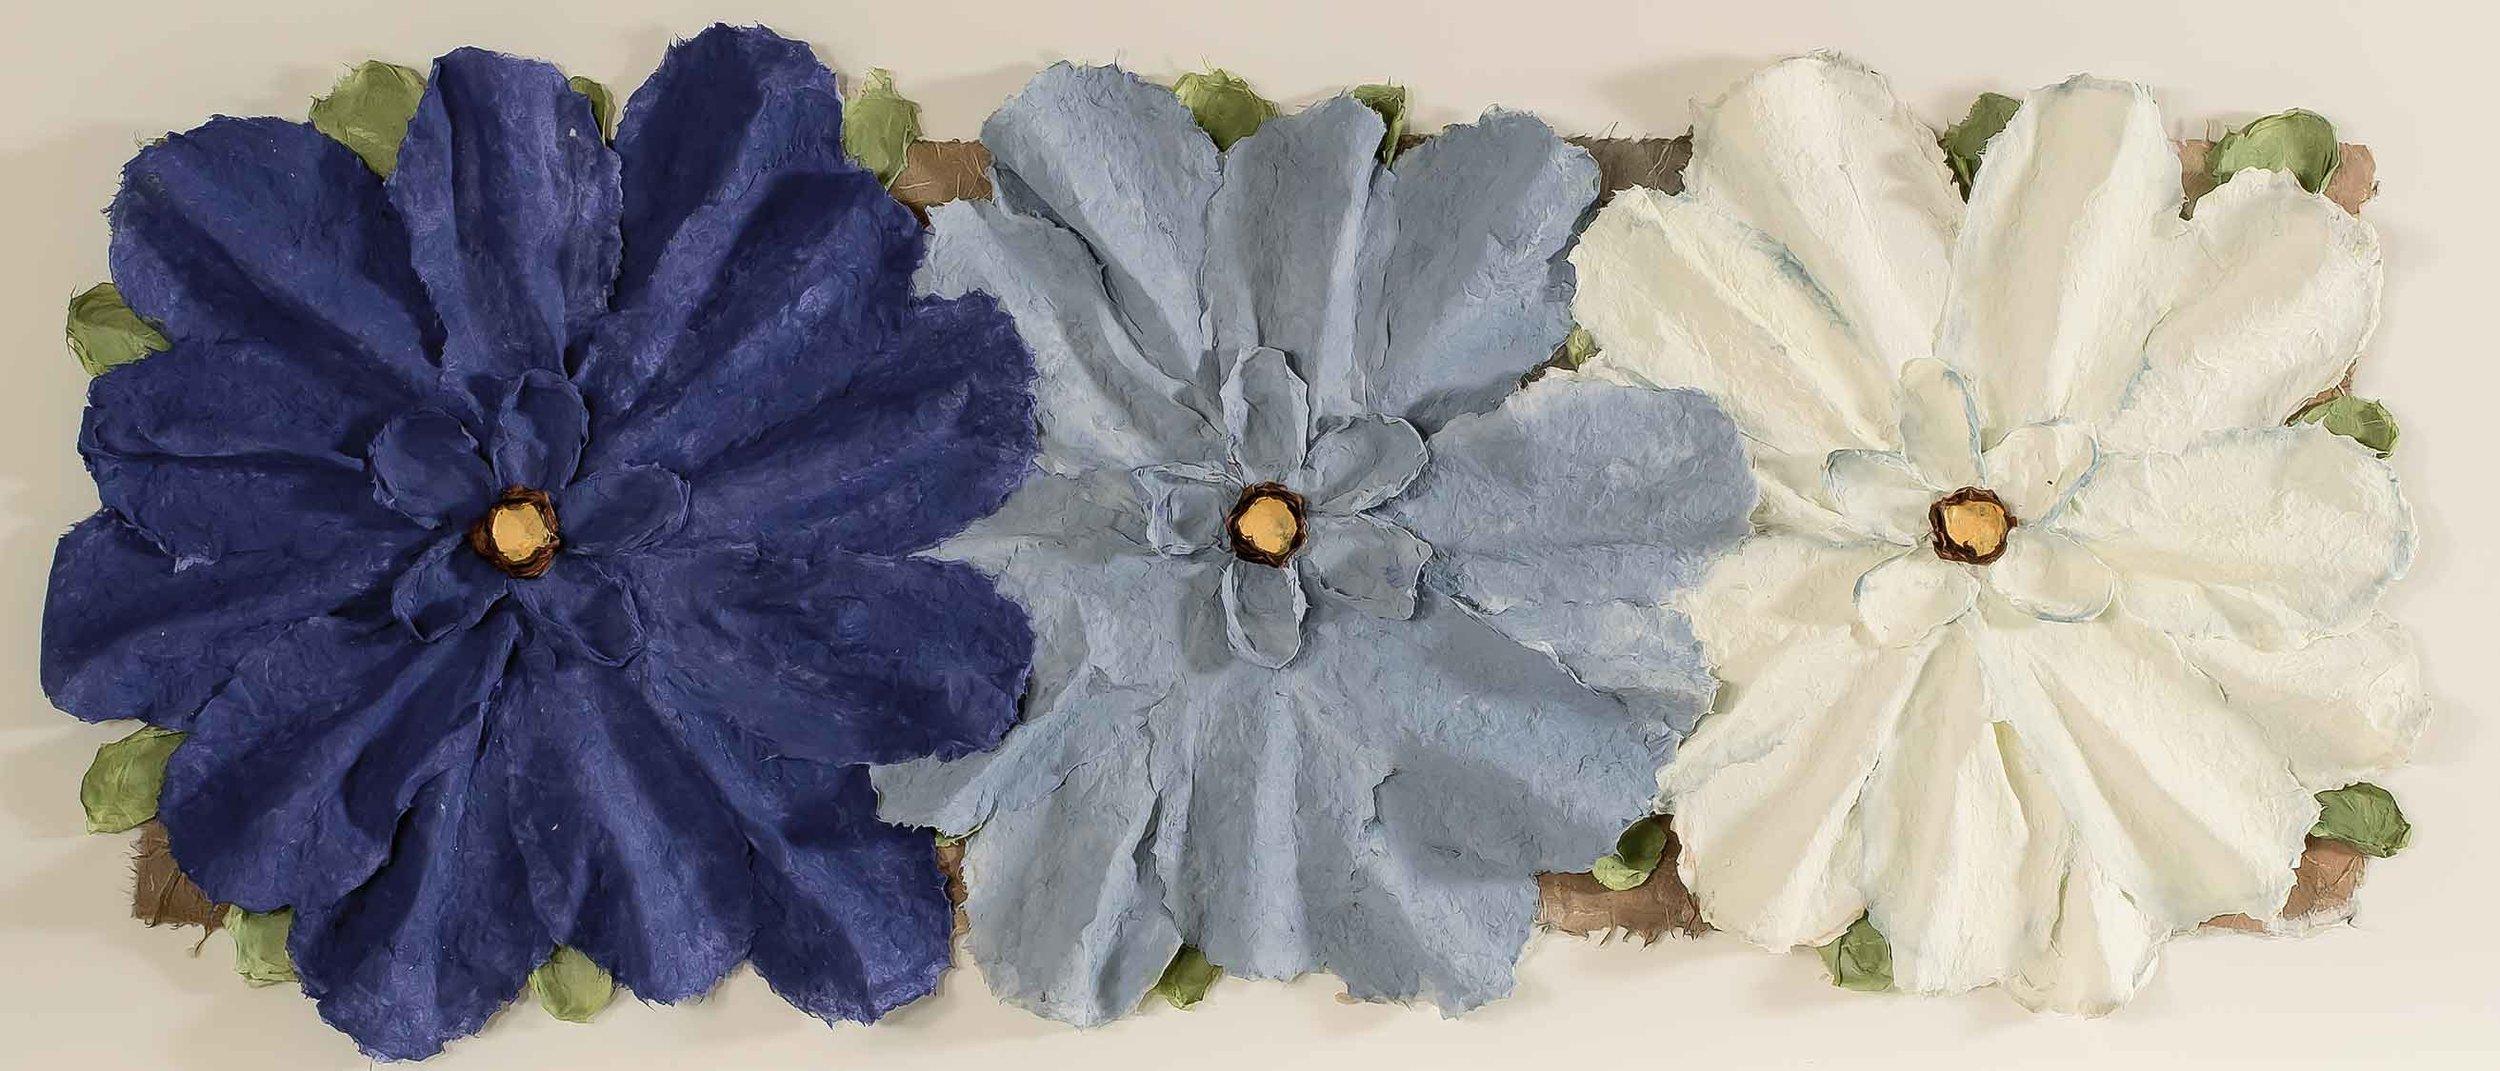 Copy of 3 Piece Blue Flowers 5x18